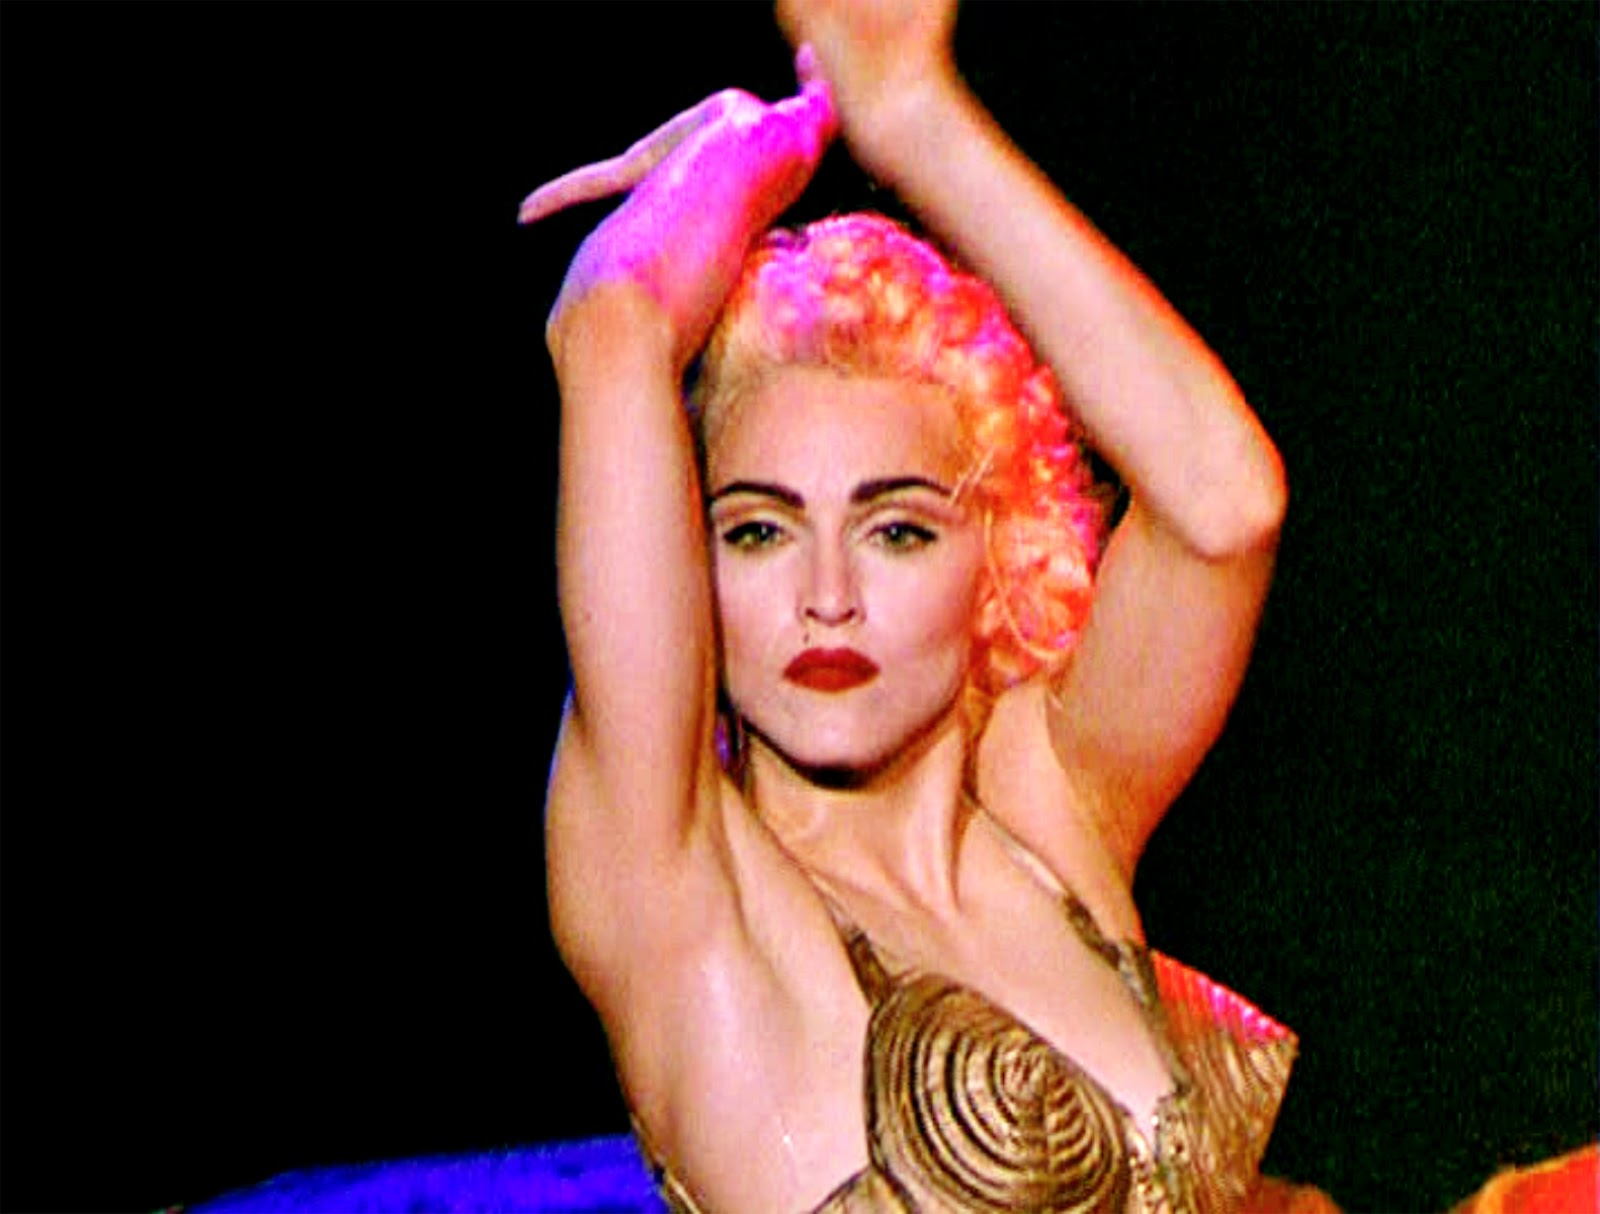 http://4.bp.blogspot.com/-YFURyC-PBcc/T4G2XM2o5EI/AAAAAAAAacw/KmR4UxMVj5M/s1600/MadonnaTruth_059Pyxurz.jpg